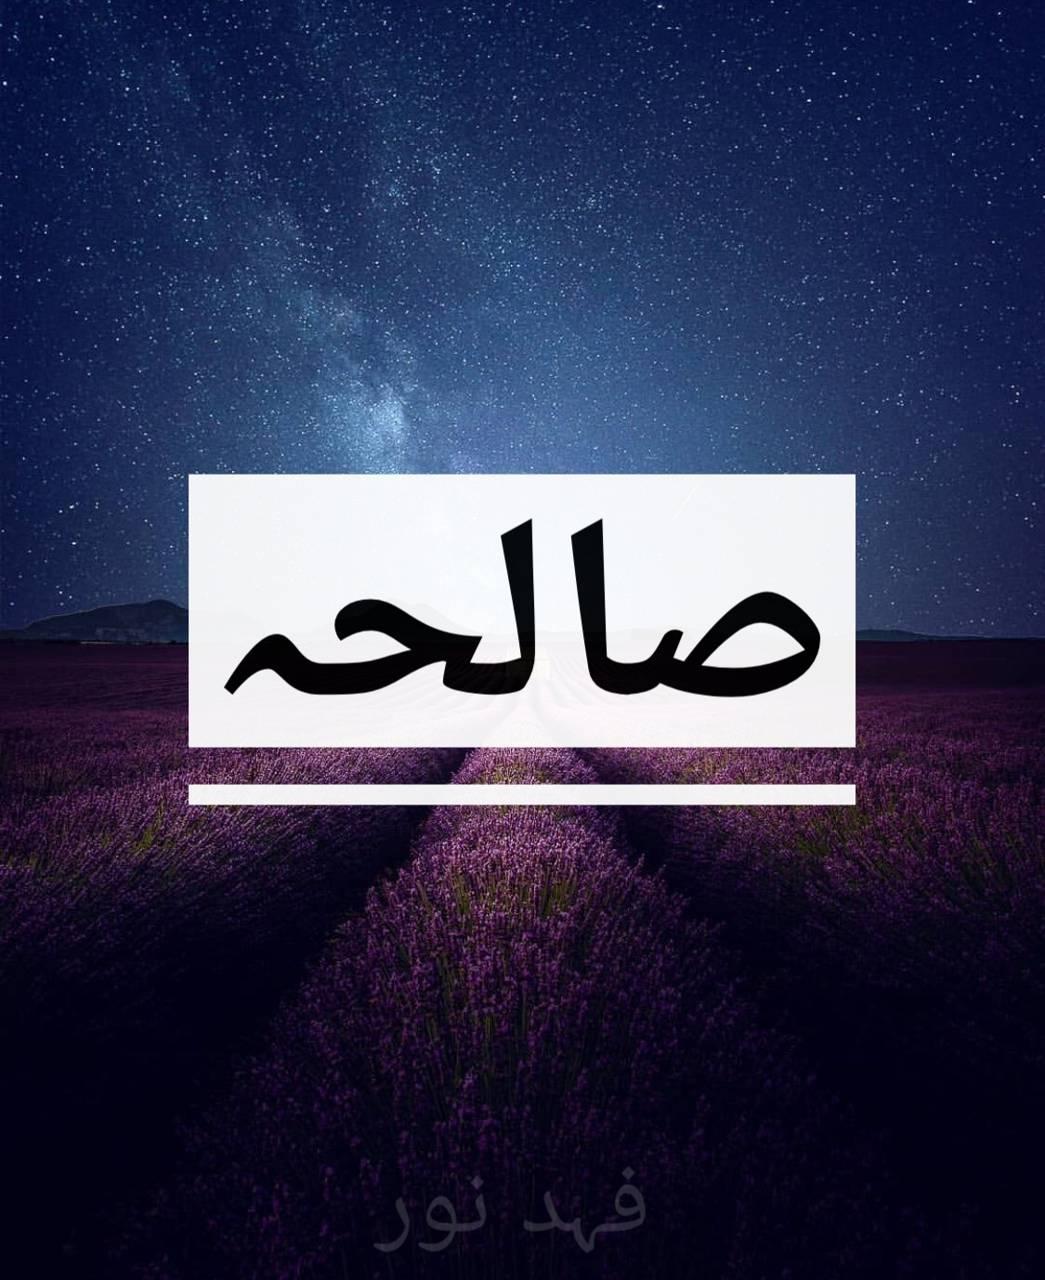 Saliha Name wallpaper by